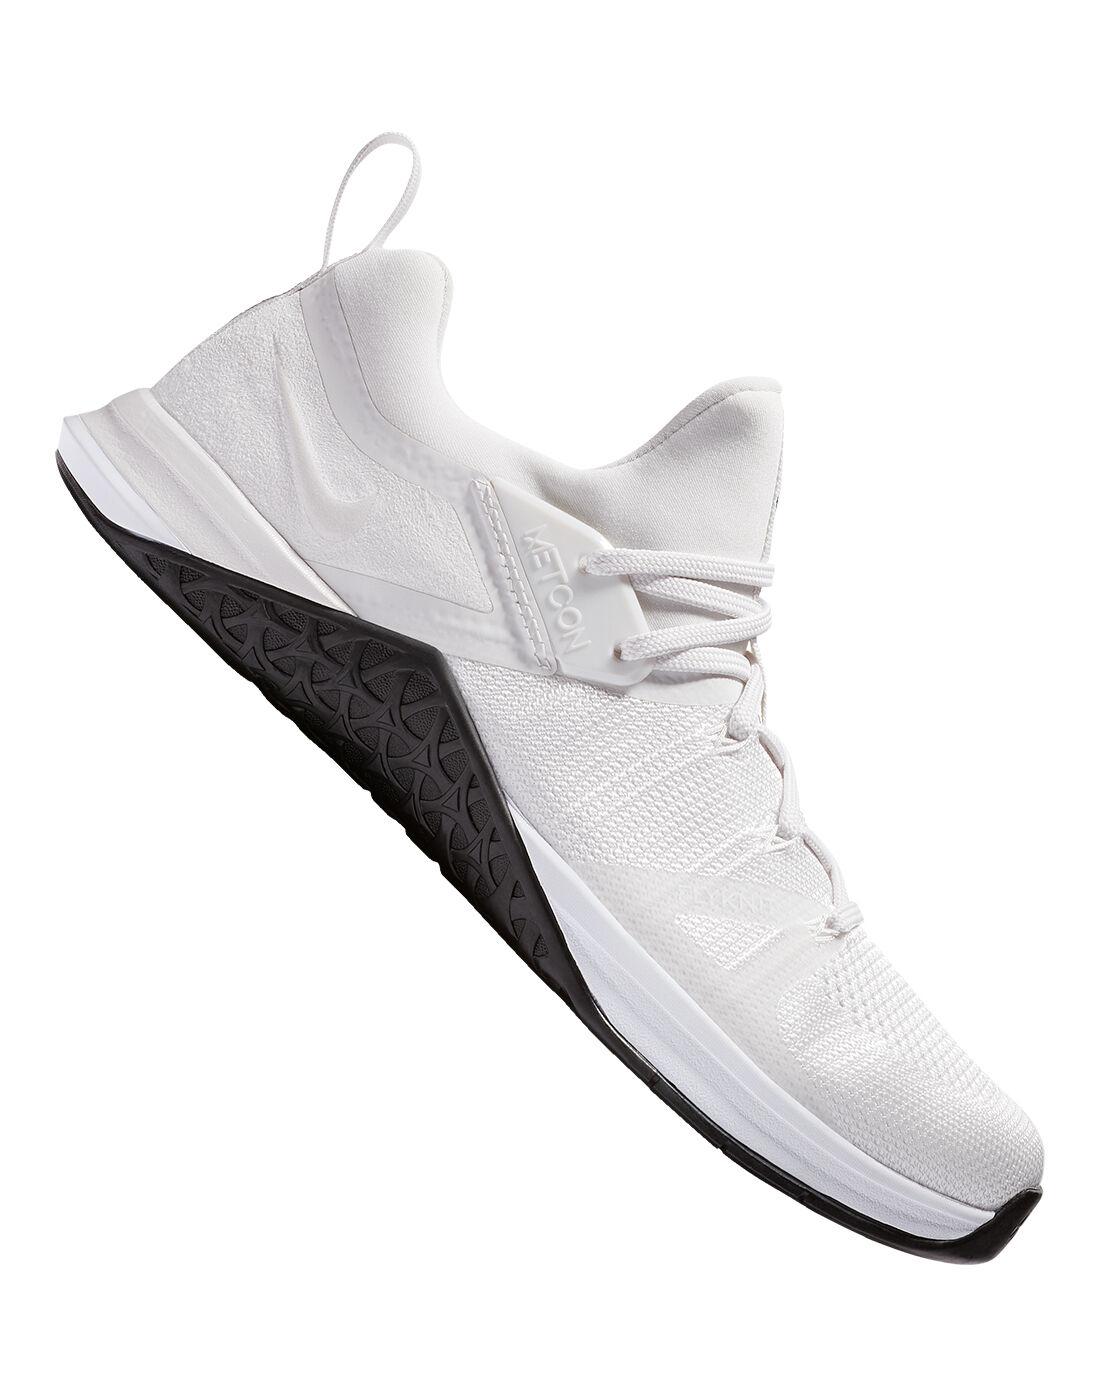 Men's White Nike Metcon Flyknit 3